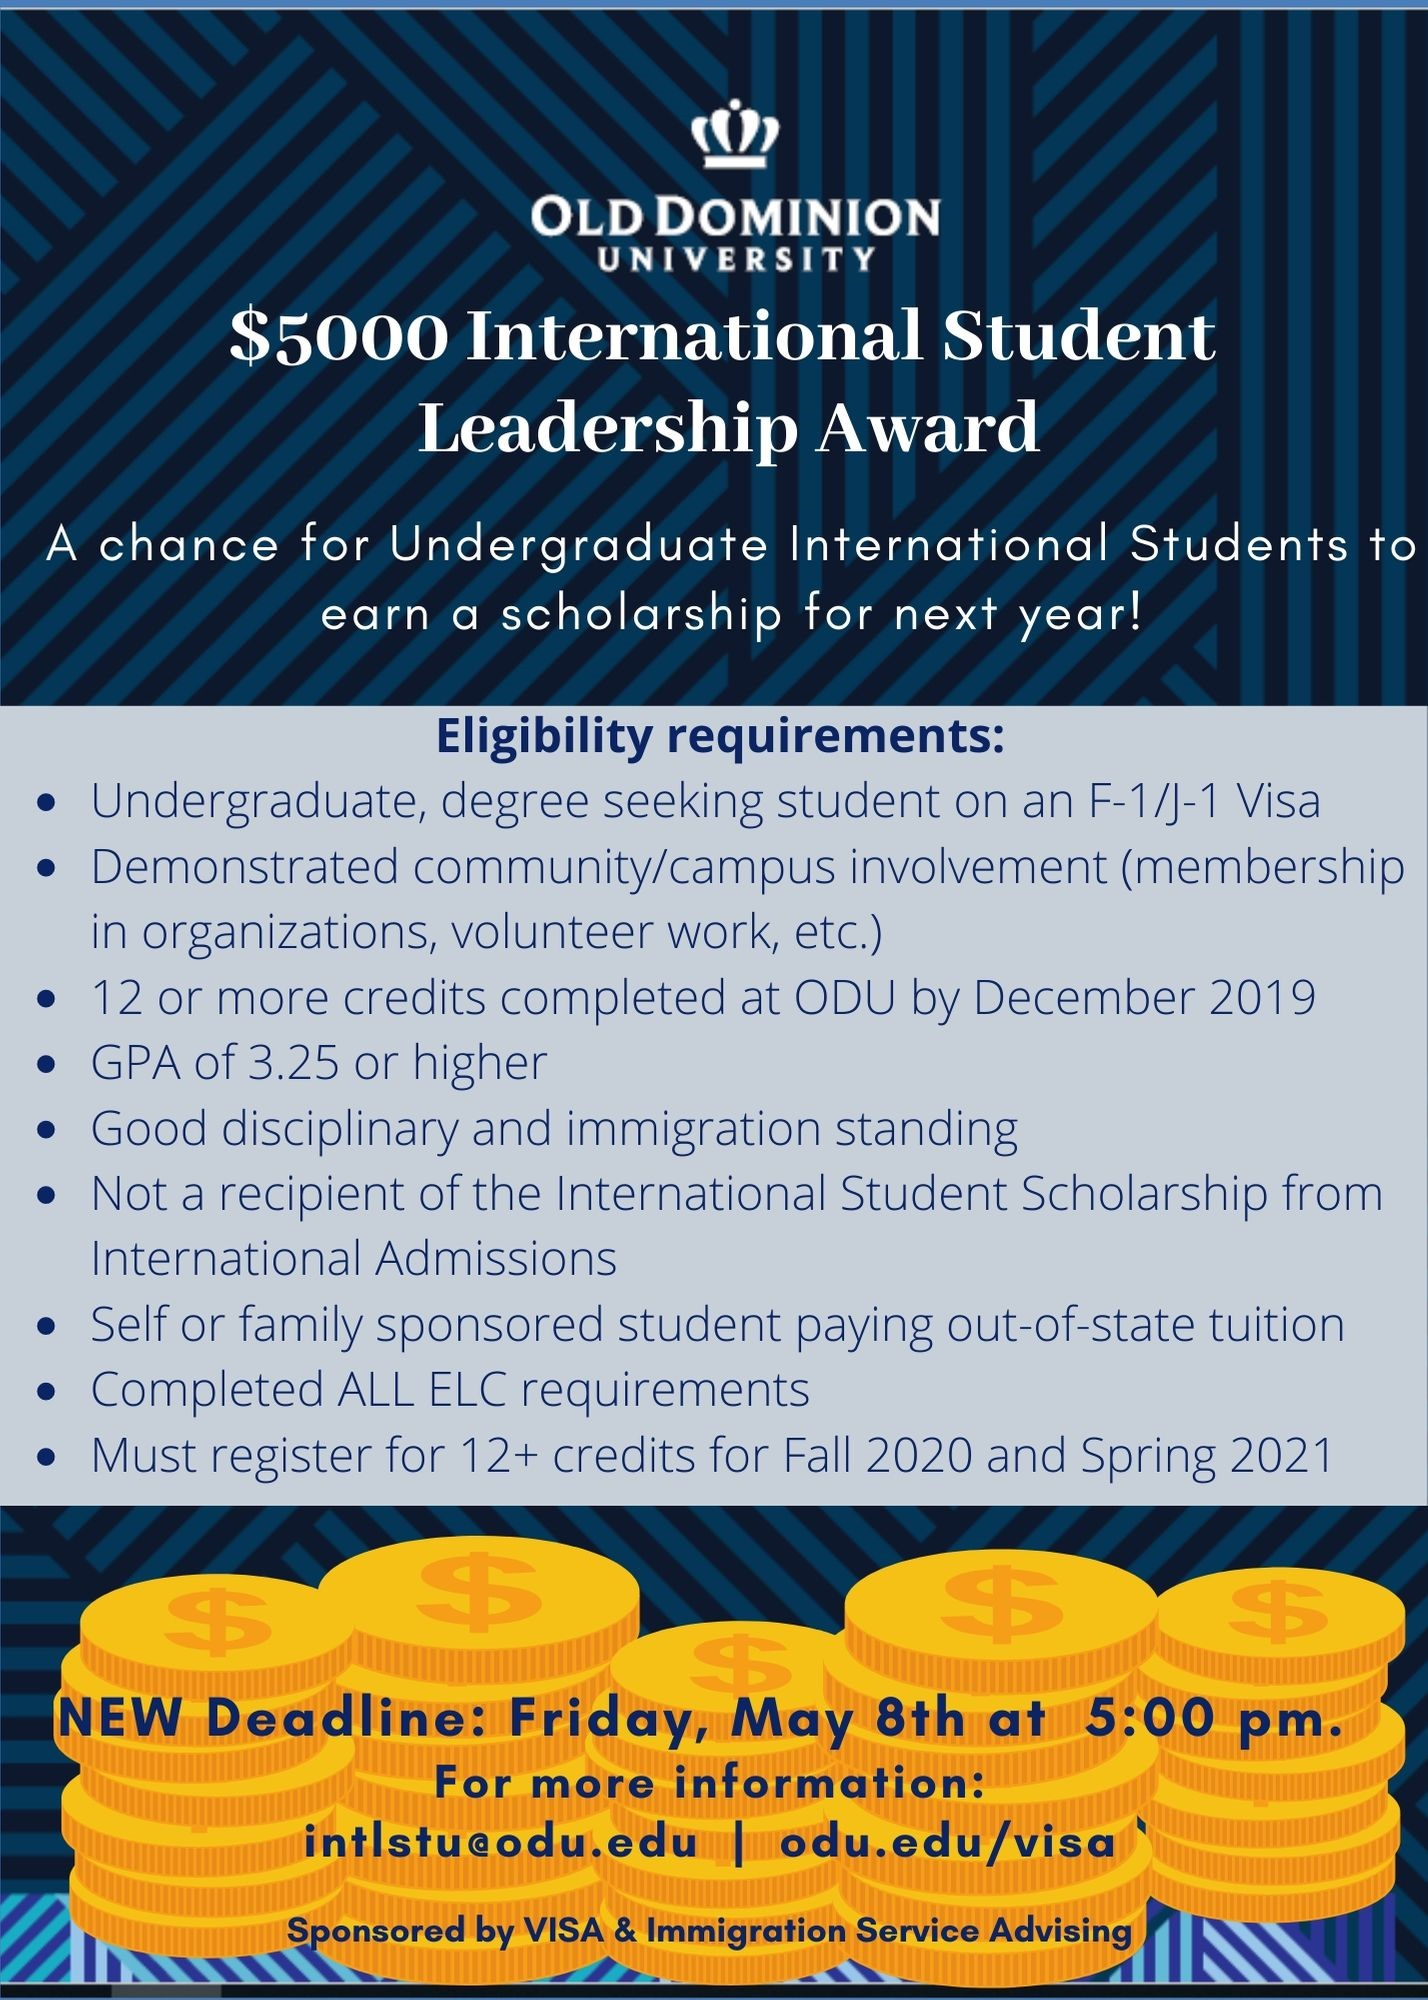 Office Of Visa & Immigration Service Advising Scholarships Inside Old Dominion University Calendar 2021